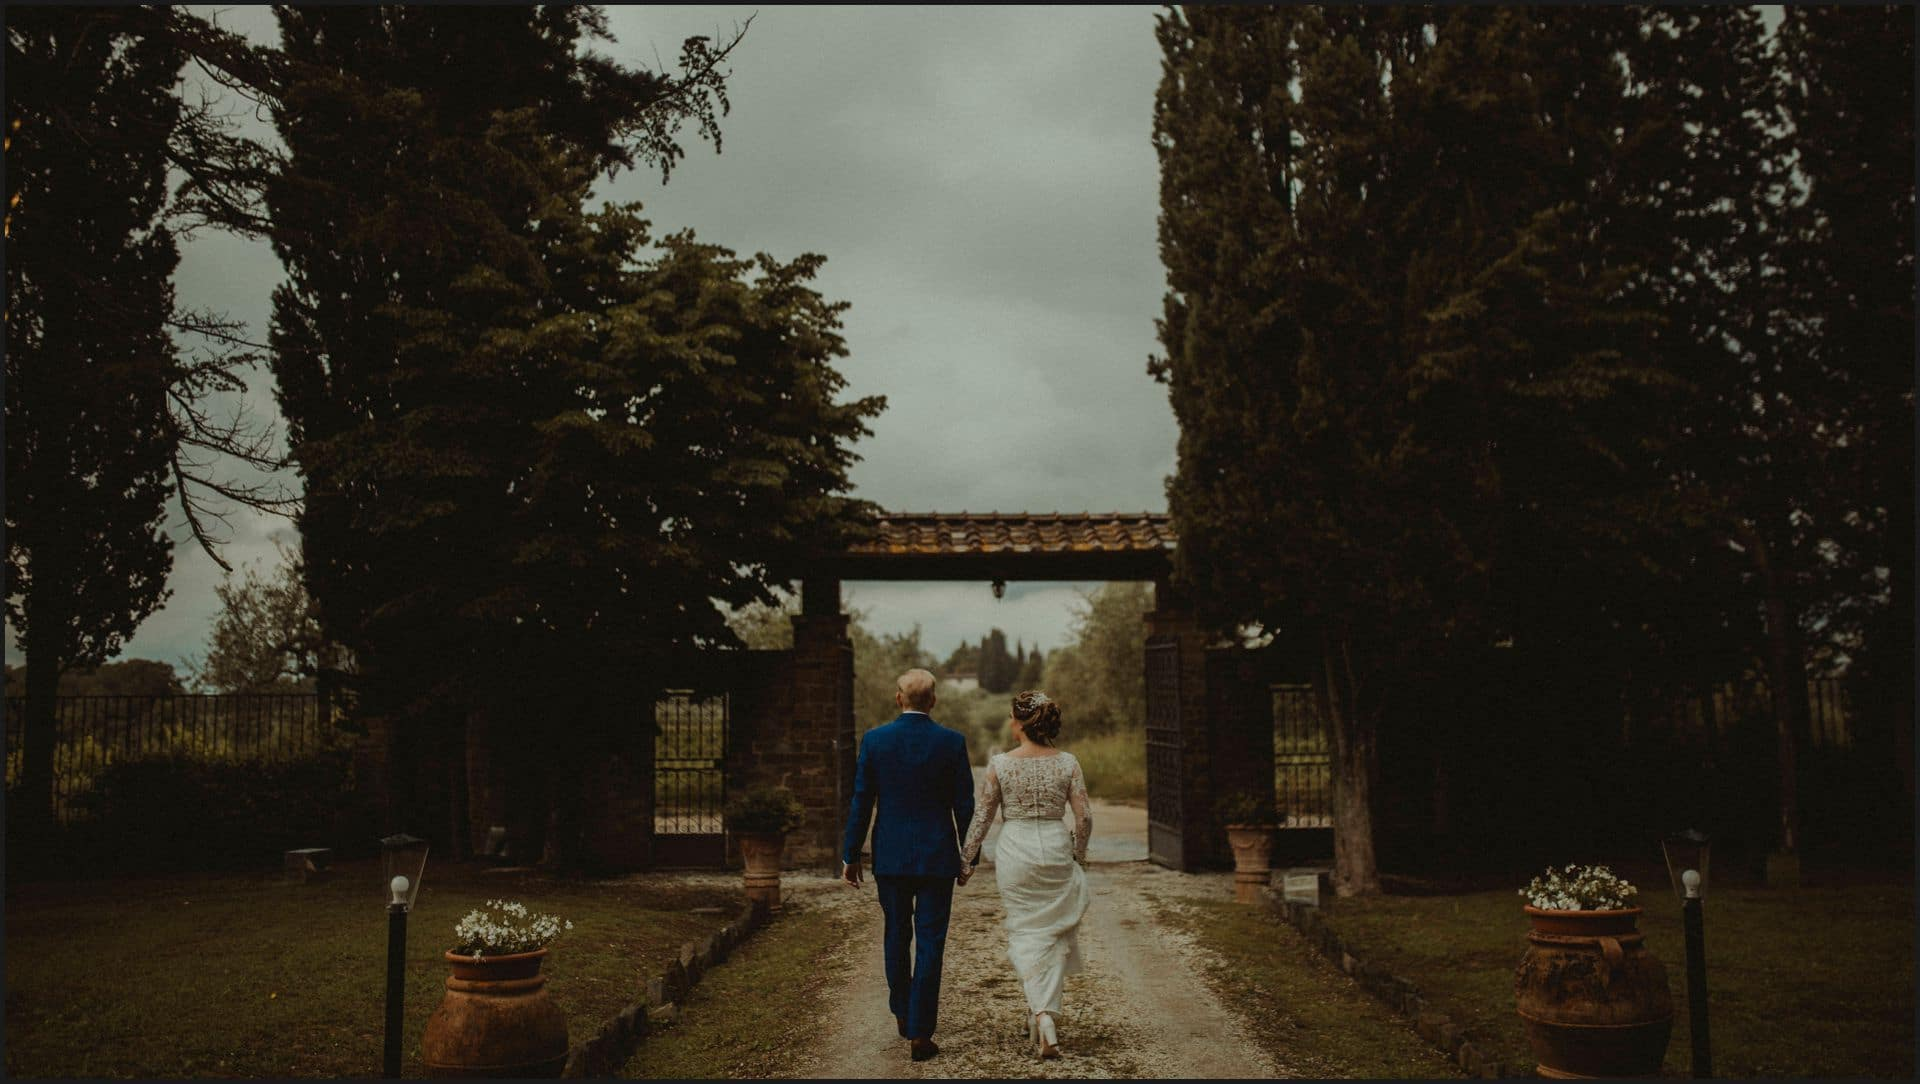 tuscany, destination wedding, chianti, bride, groom, walking, outdoor